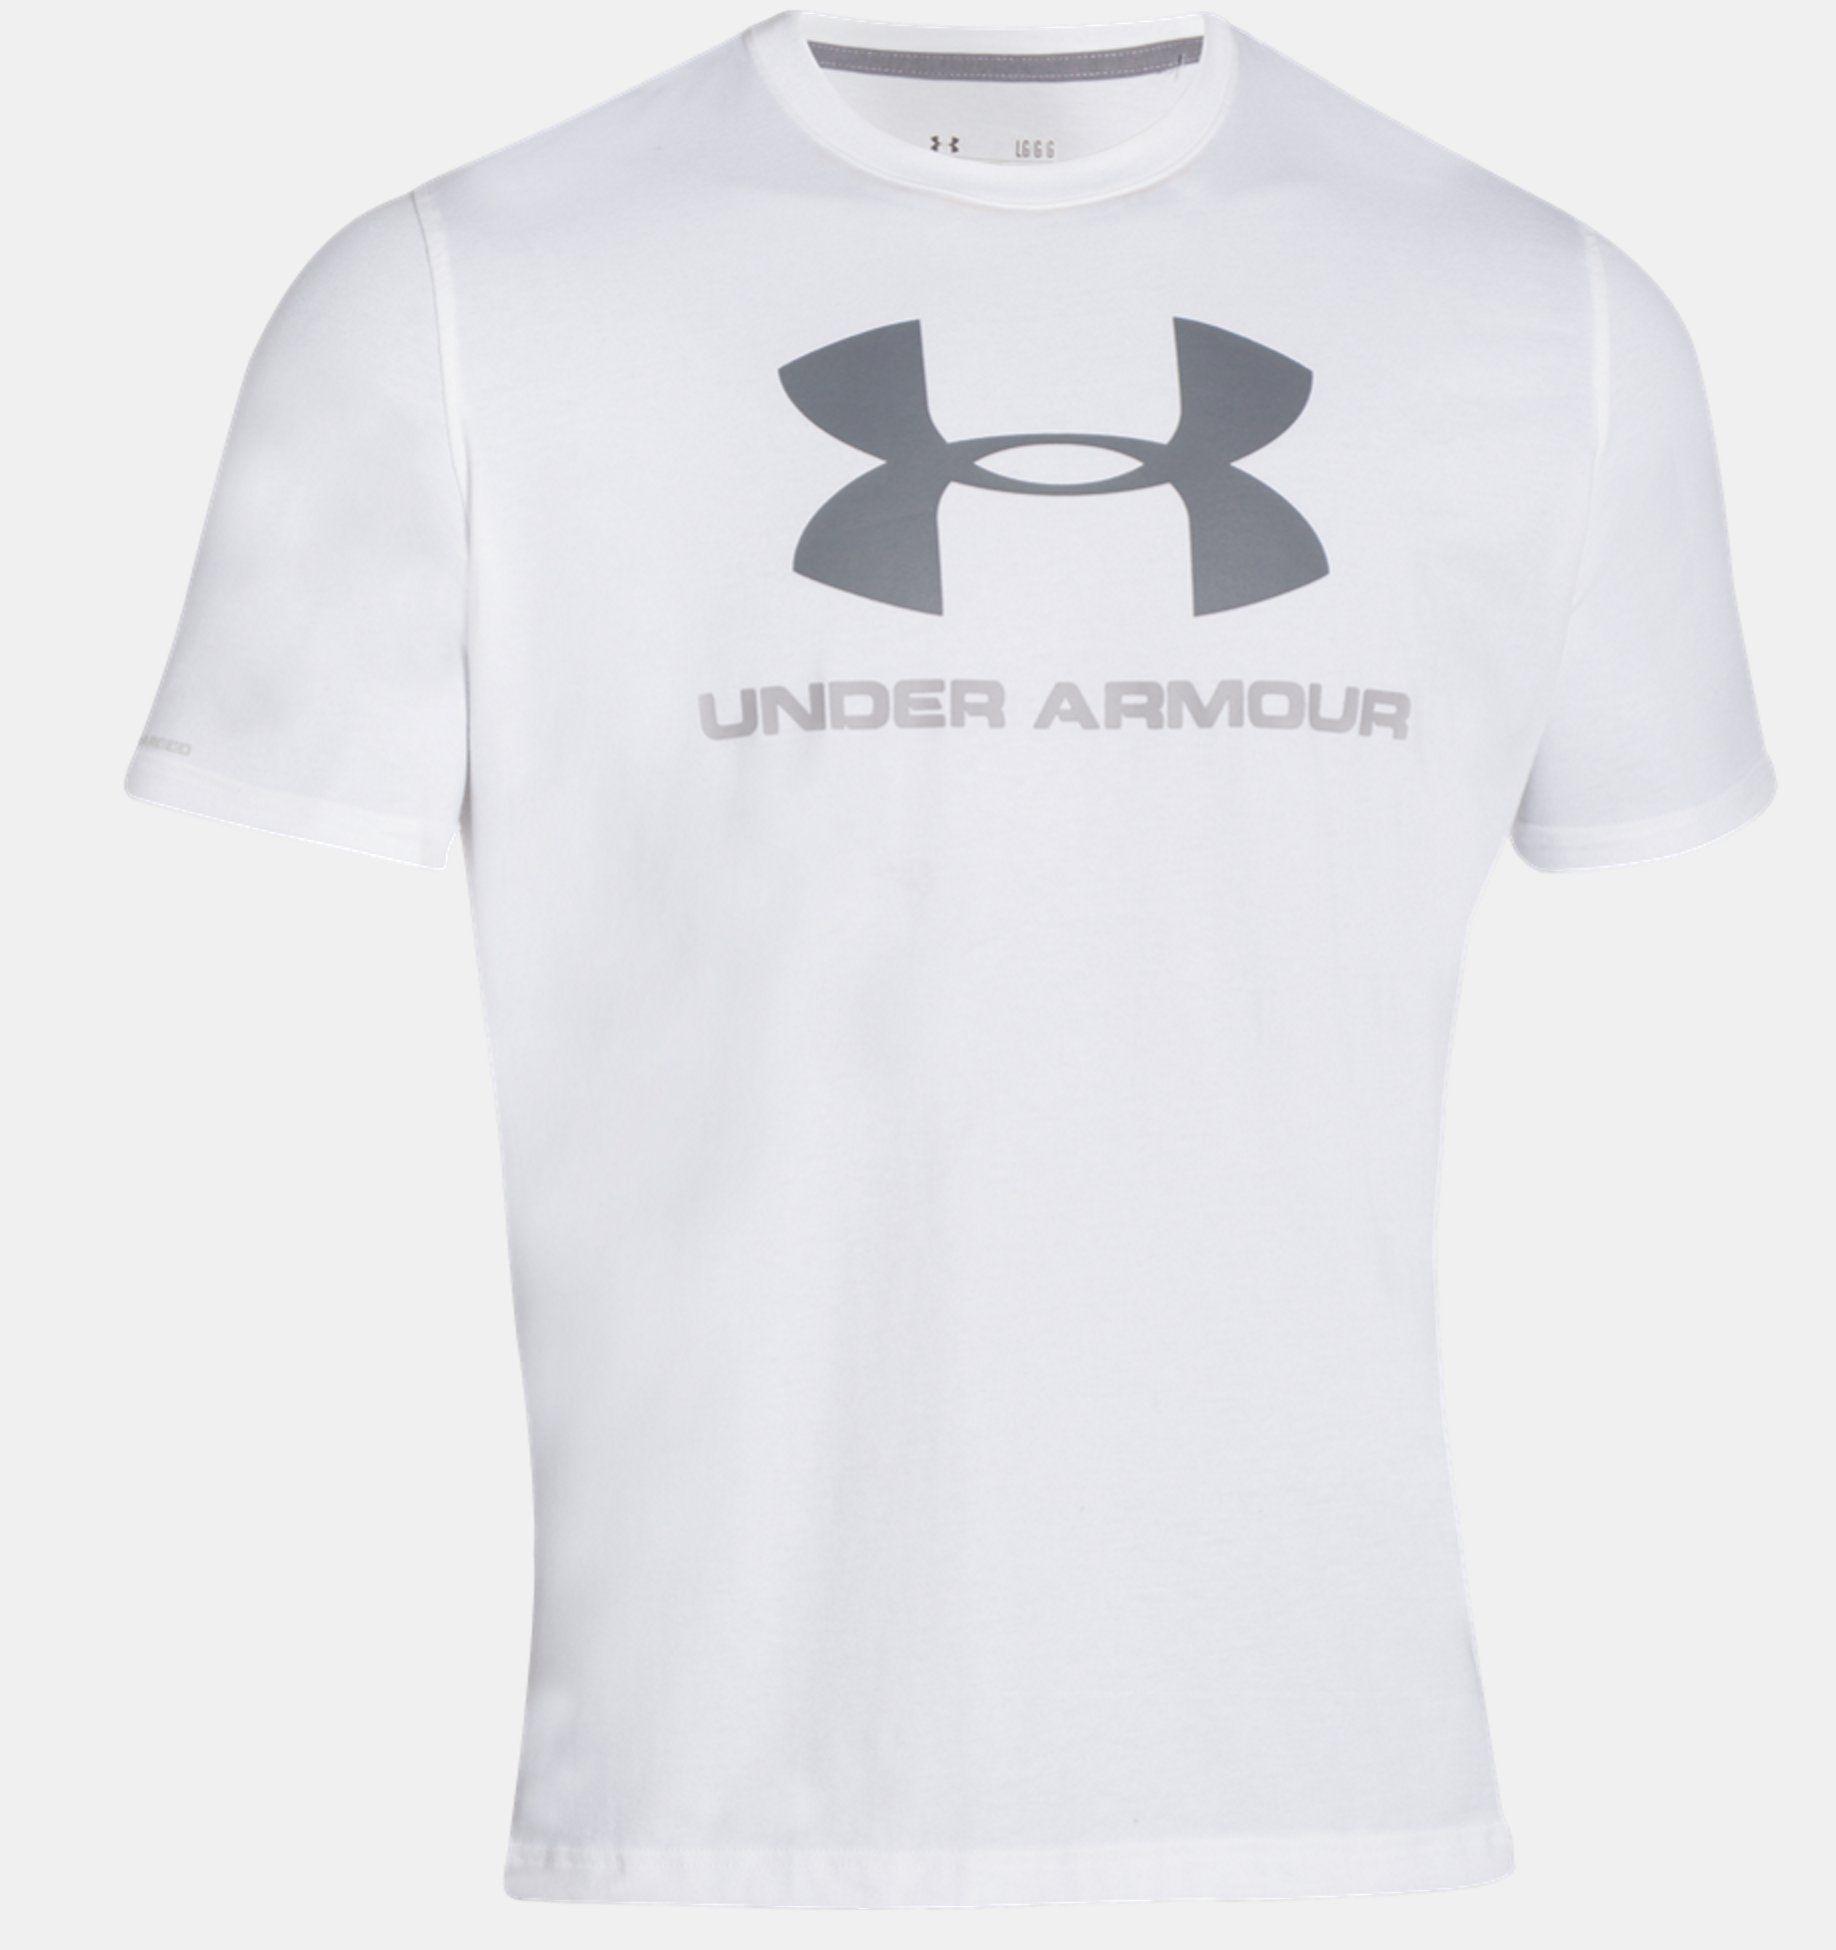 23f4da822 Camiseta Under Armour Sportstyle Masculina - BRACIA SHOP  Loja de ...